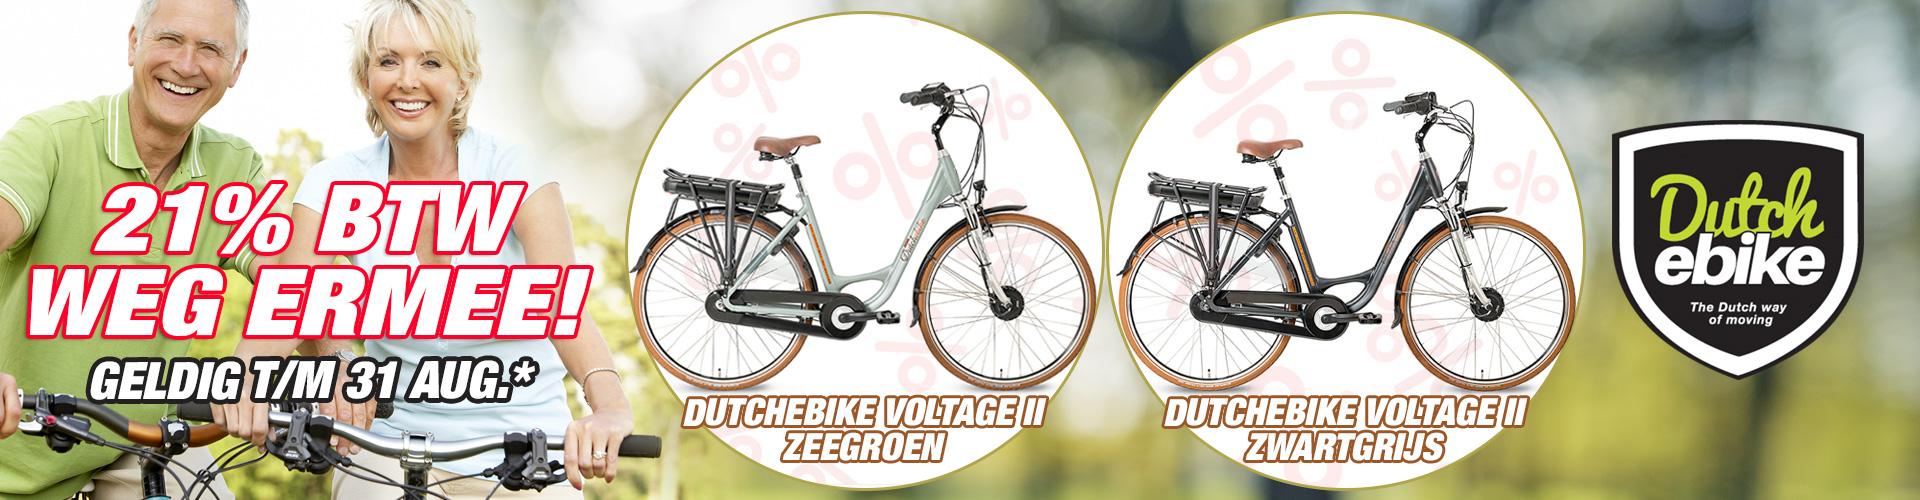 DutchEbike BTW korting